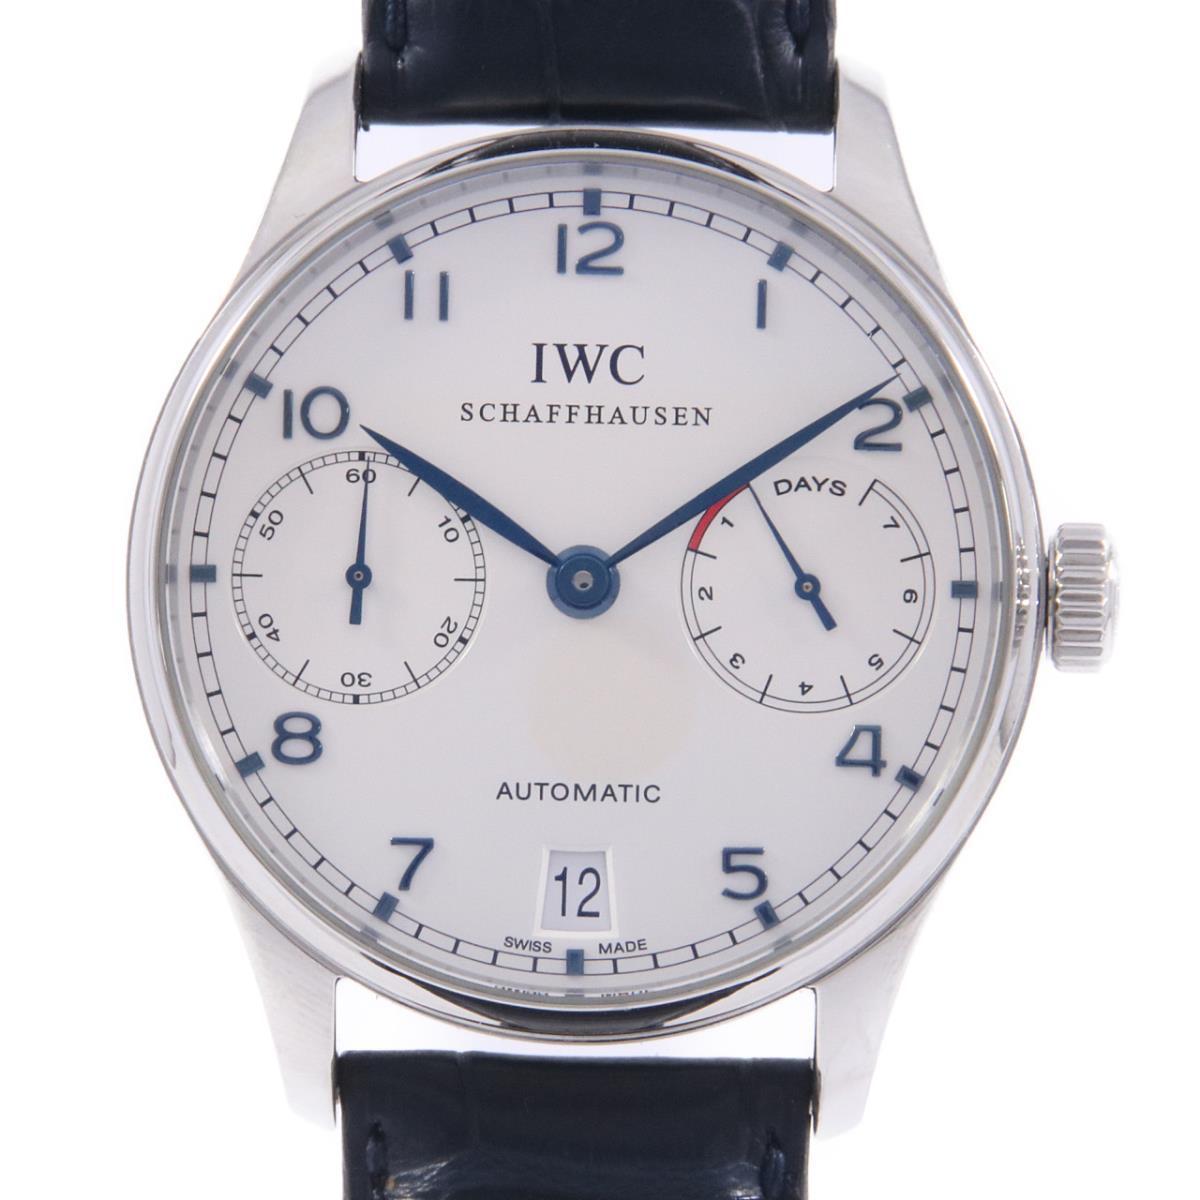 IWC IW500107 ポルトギーゼオートマティック 自動巻【中古】